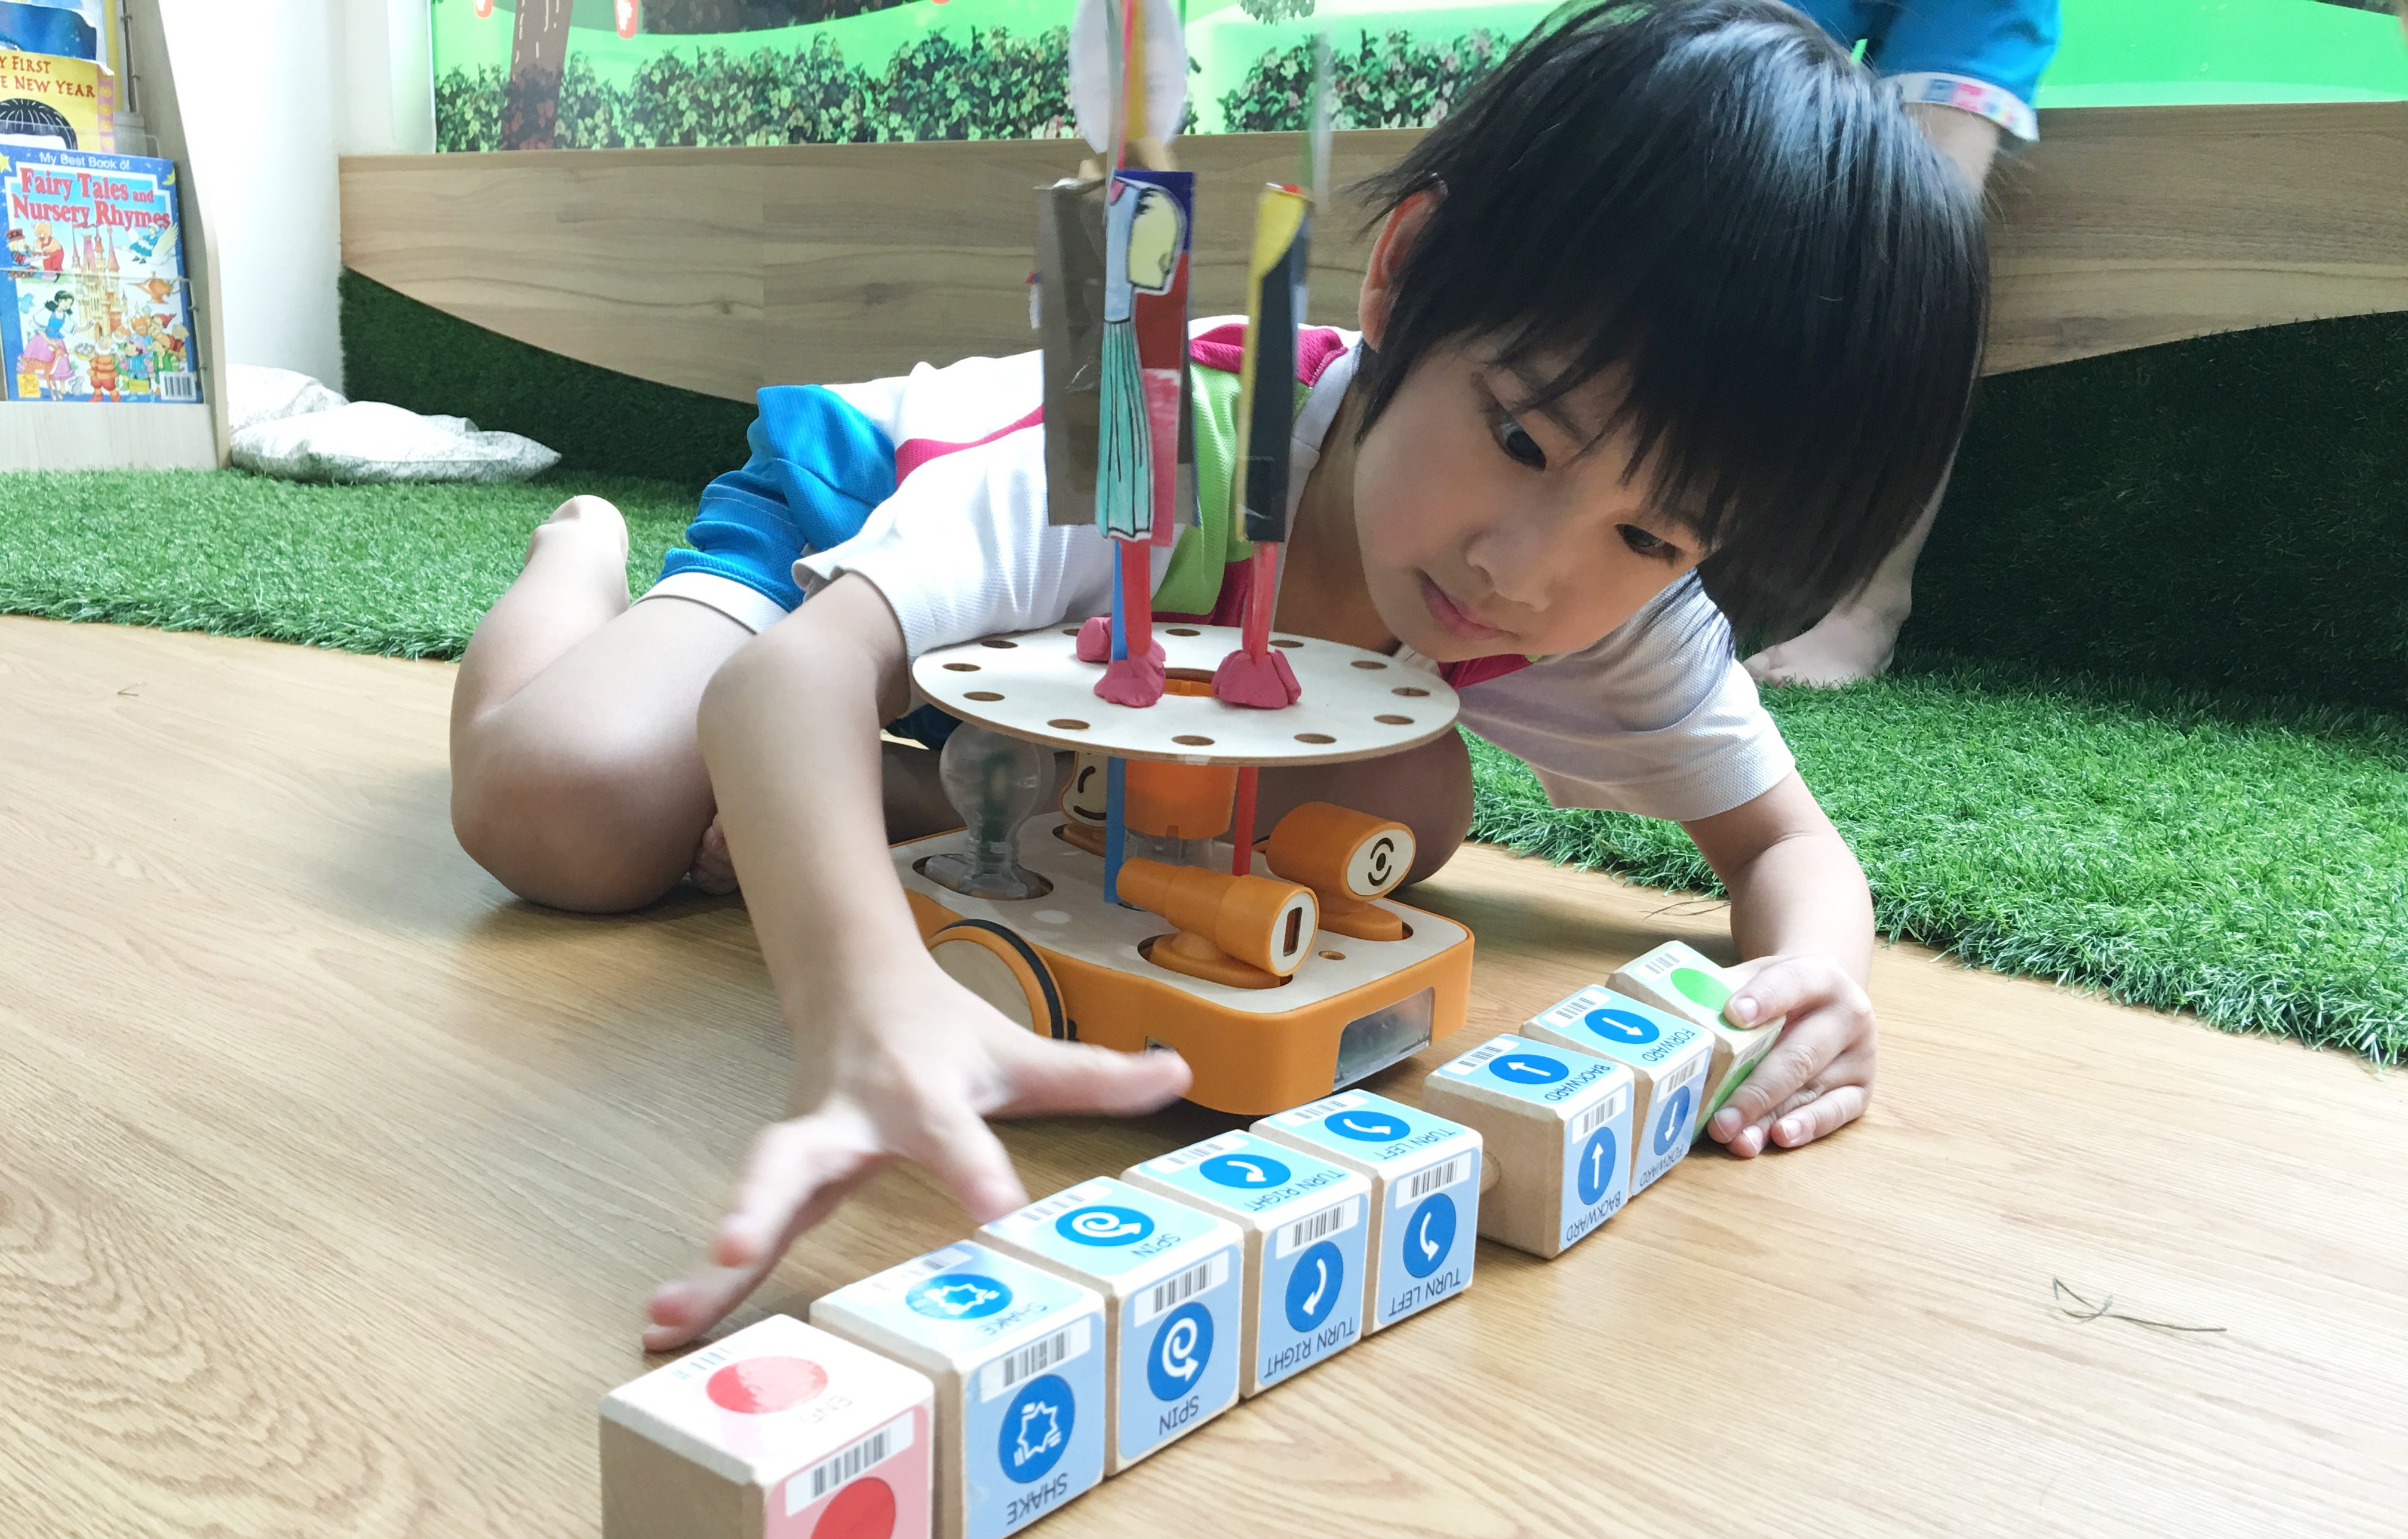 PlayMaker image